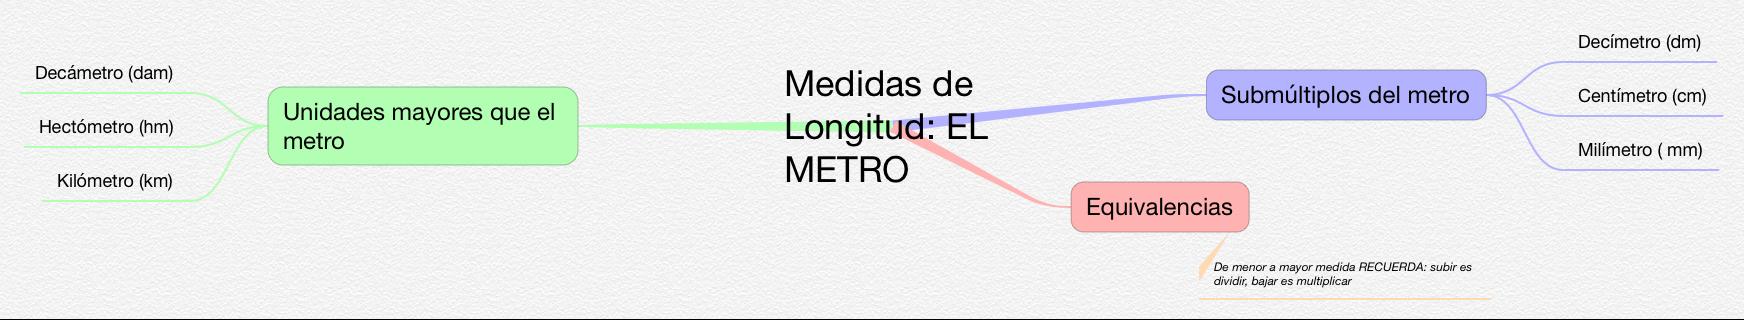 MATEMATICAS_MEDIDAS DE LONGITUD_4